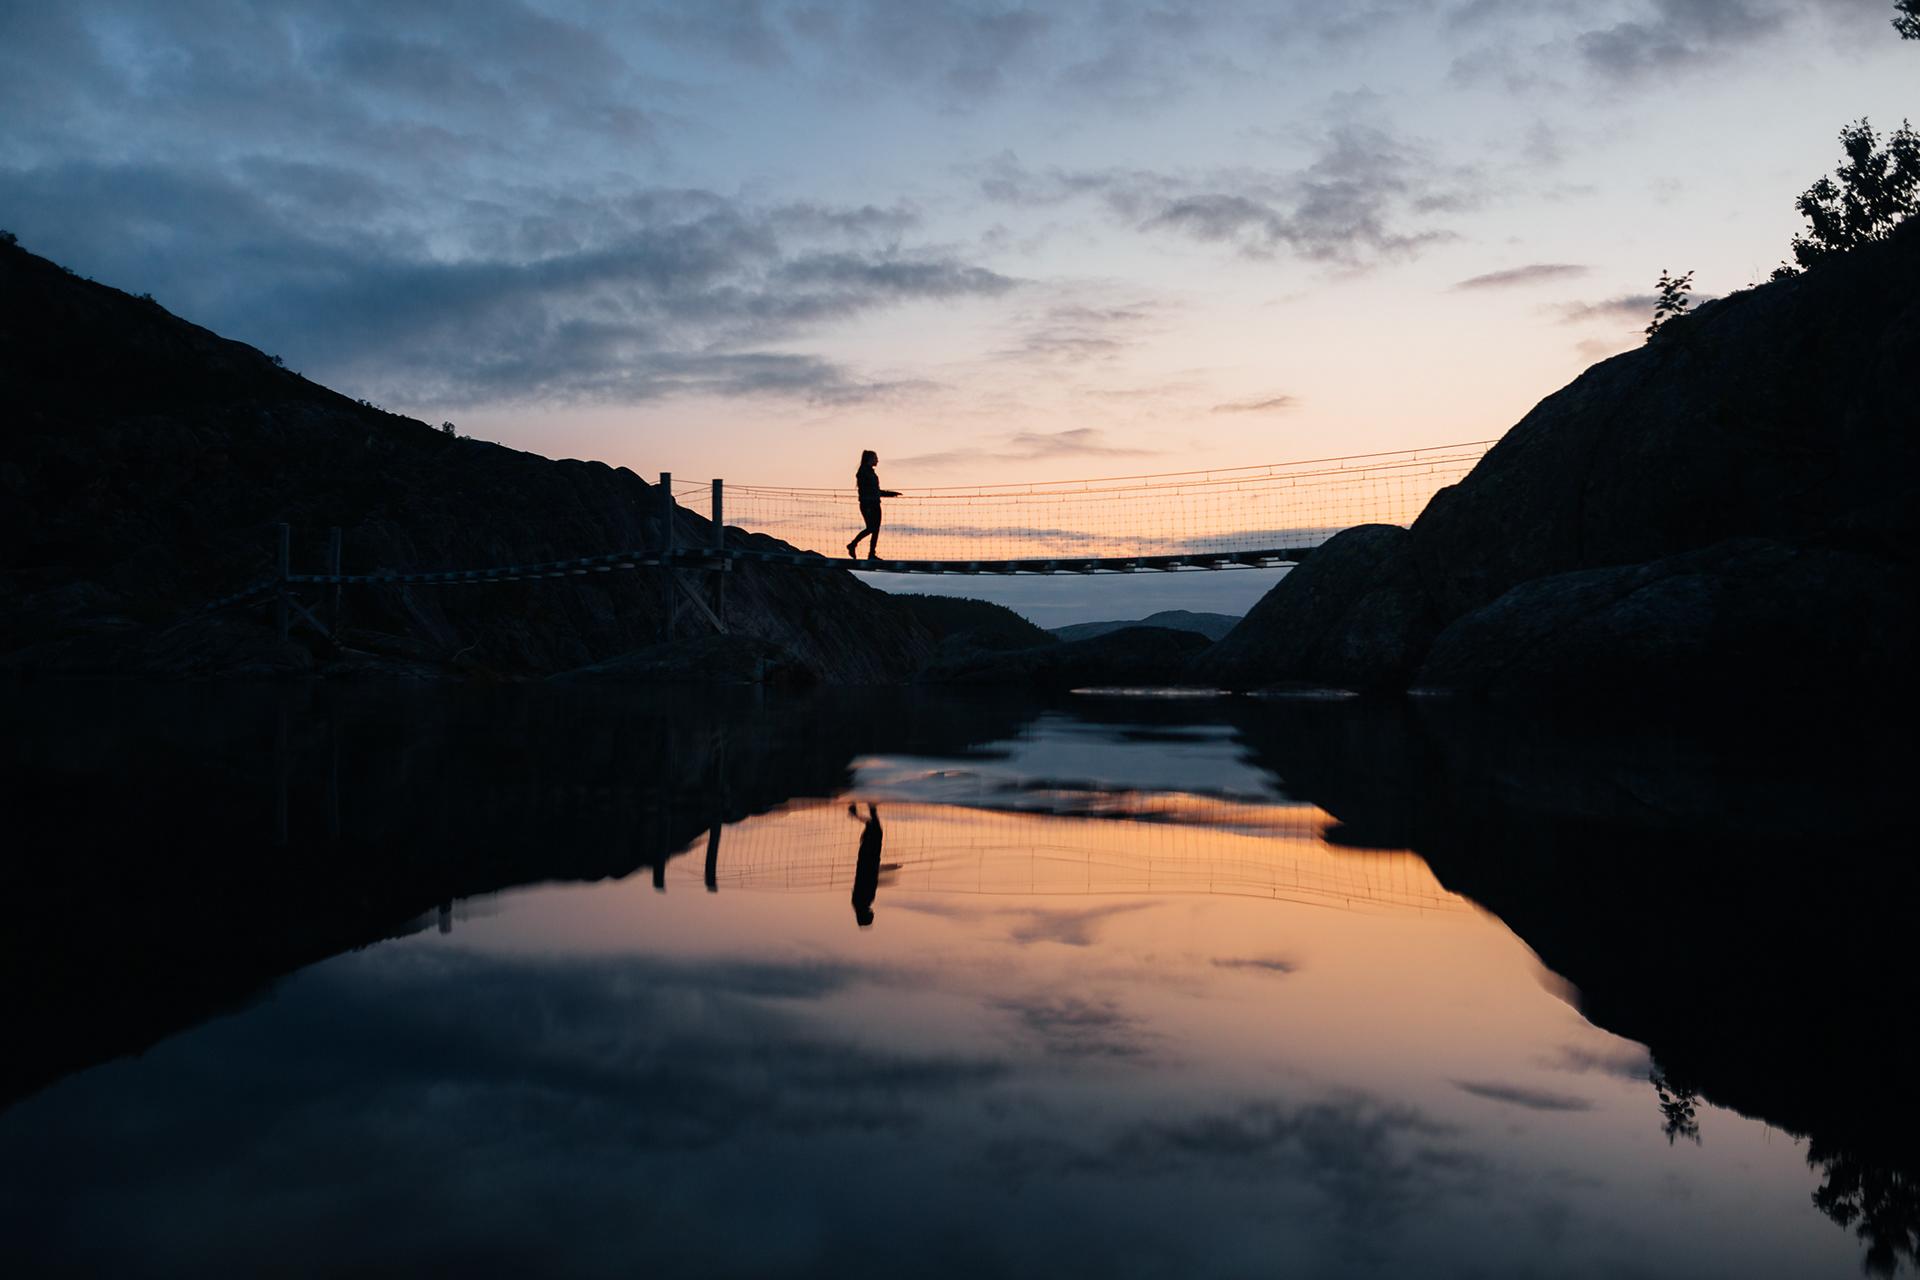 Photography,Photojournalism,Digital Photography